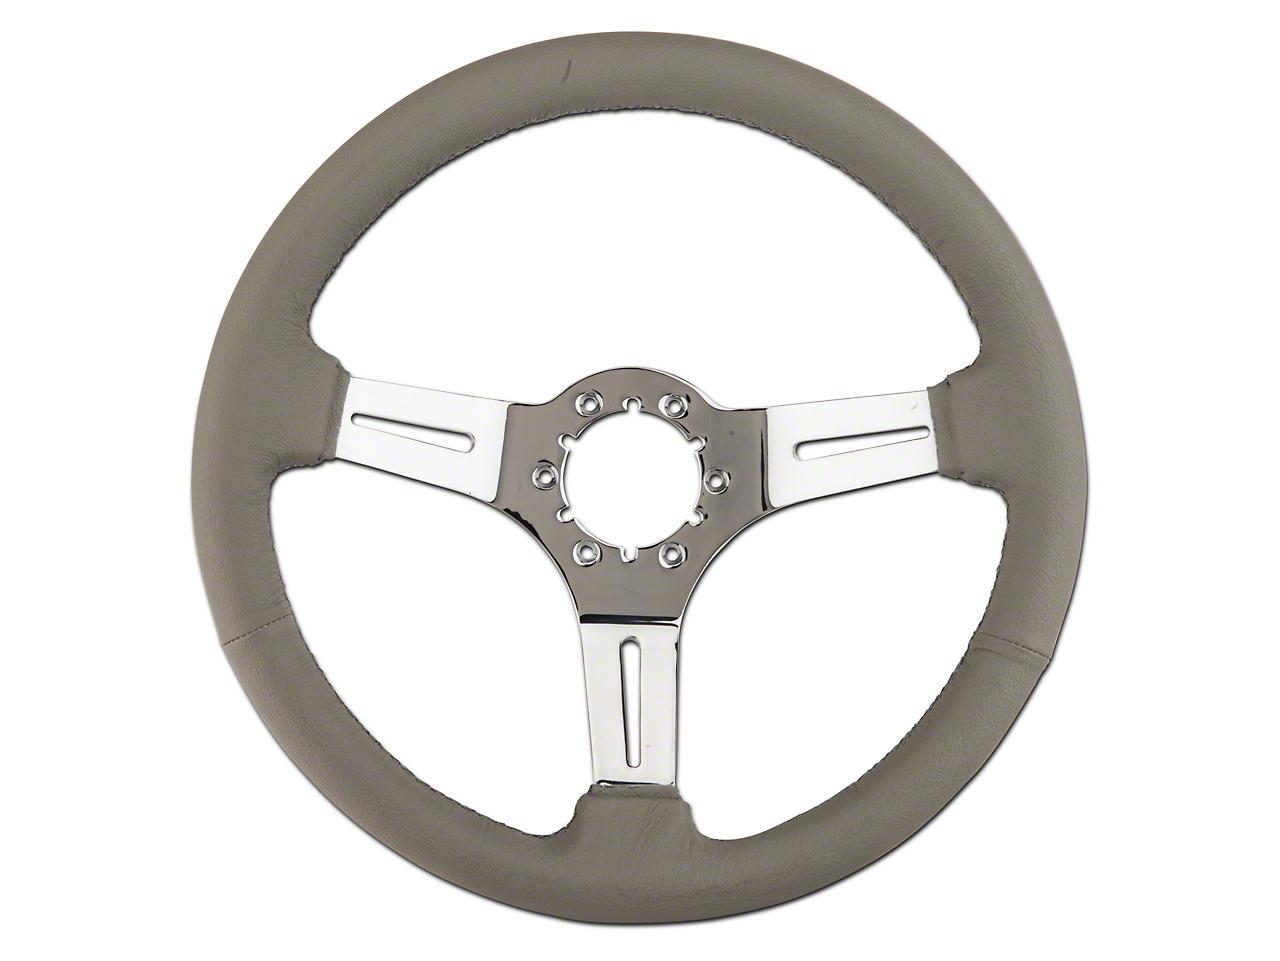 MethodWorks Gray Leather Steering Wheel (79-04 All)